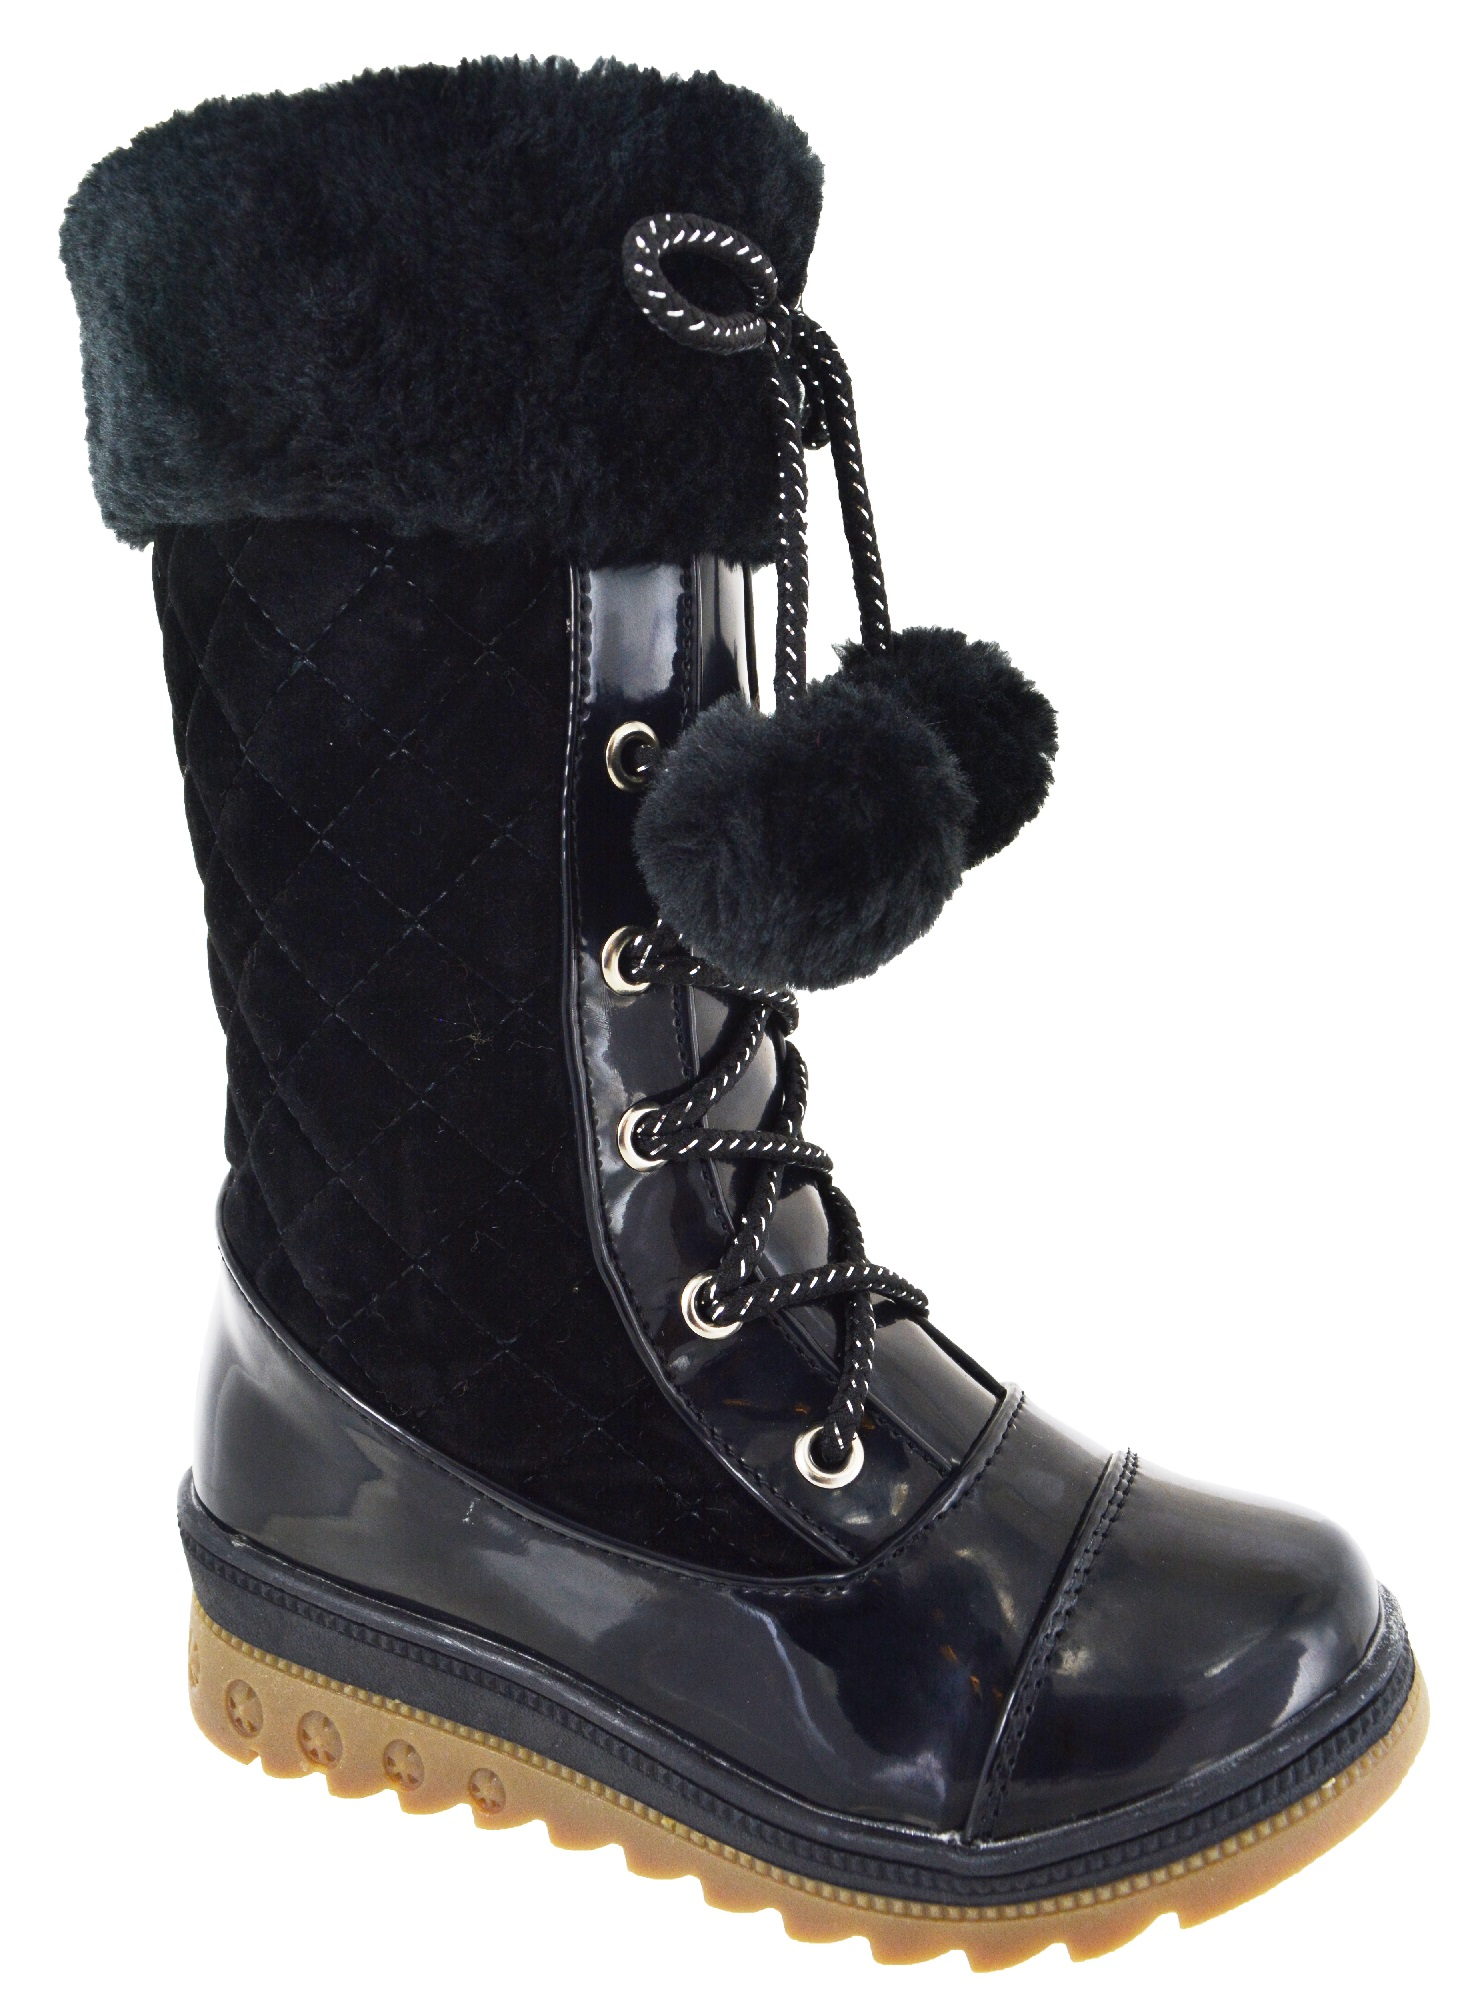 New Kids Mid Calf Fashion Girls Winter Warm Low Heel Wedge